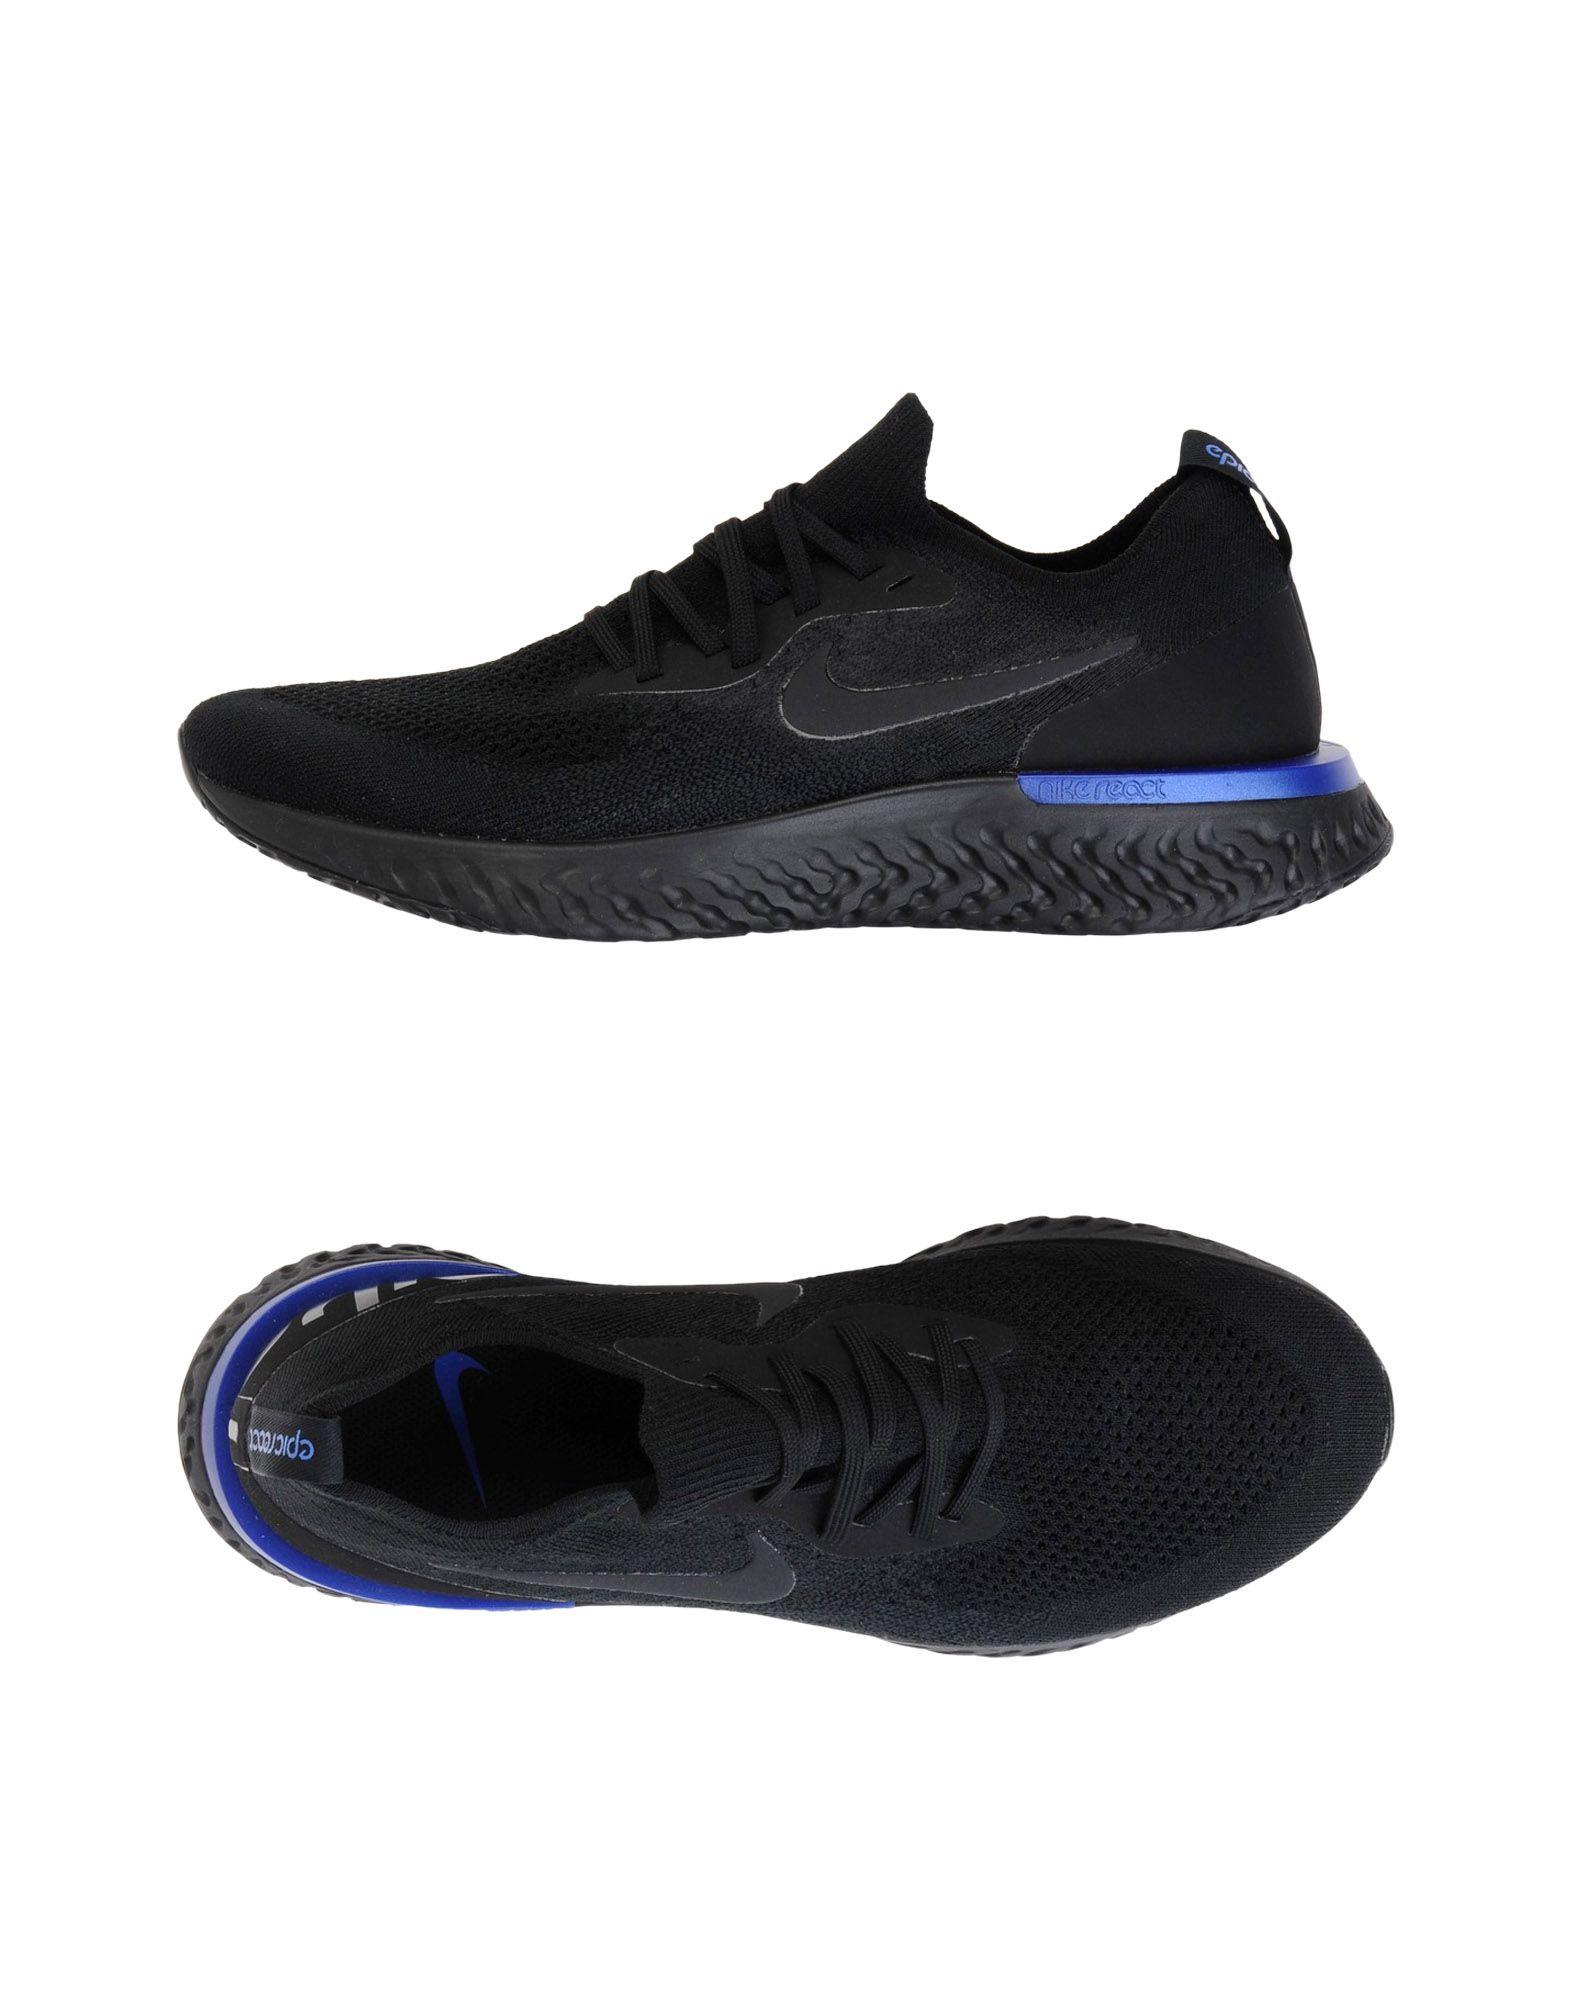 Sneakers Nike  Epic React Flyknit - Homme - Sneakers Nike  Noir Spécial temps limité